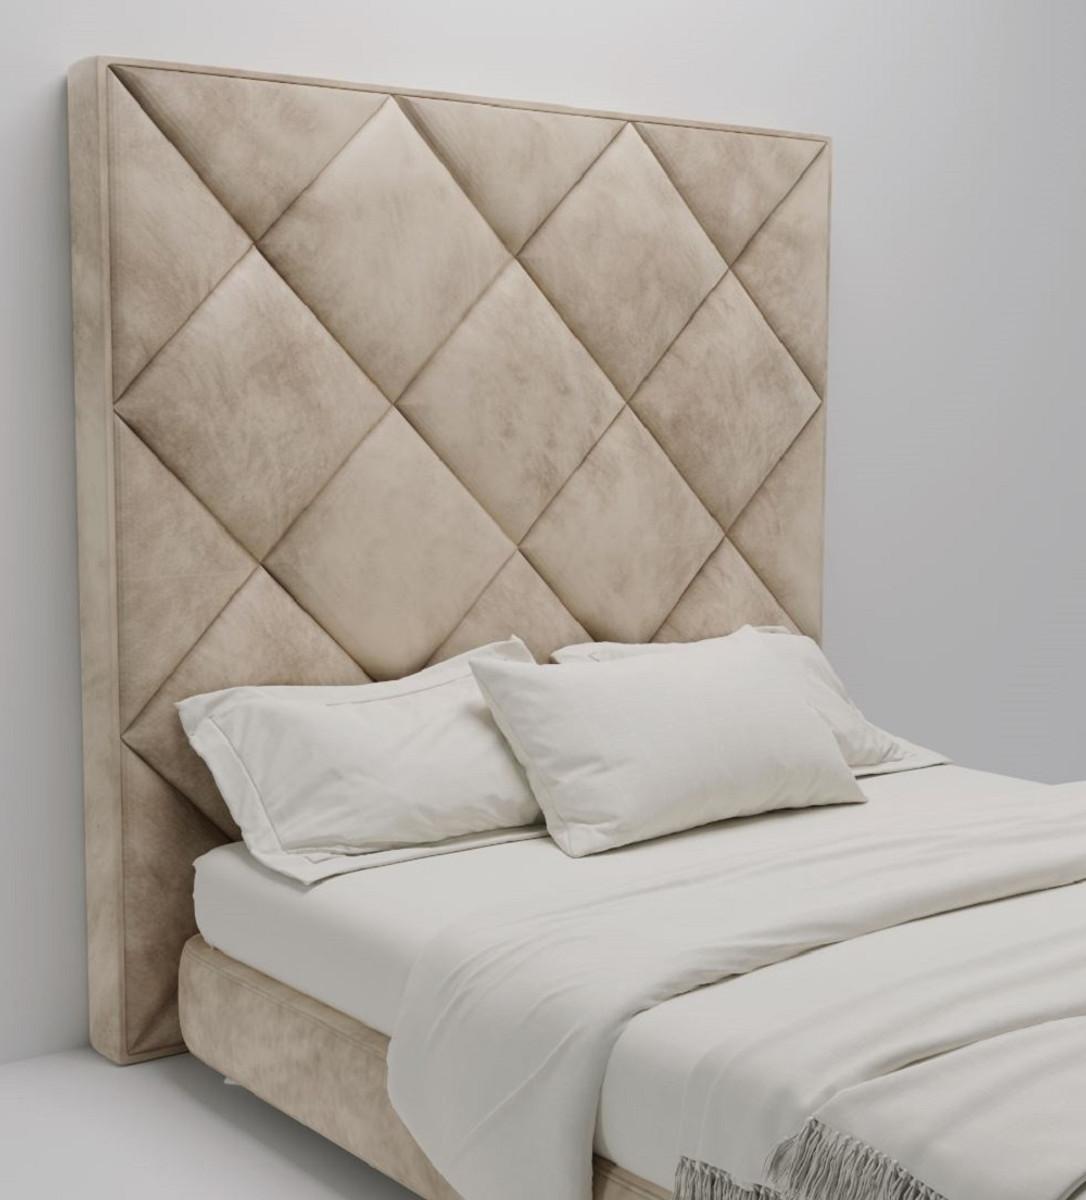 Casa Padrino Luxury Velvet Bed Headboard Beige 190 X 14 X H 240 Cm Bedroom Furniture Hotel Furniture Luxury Quality